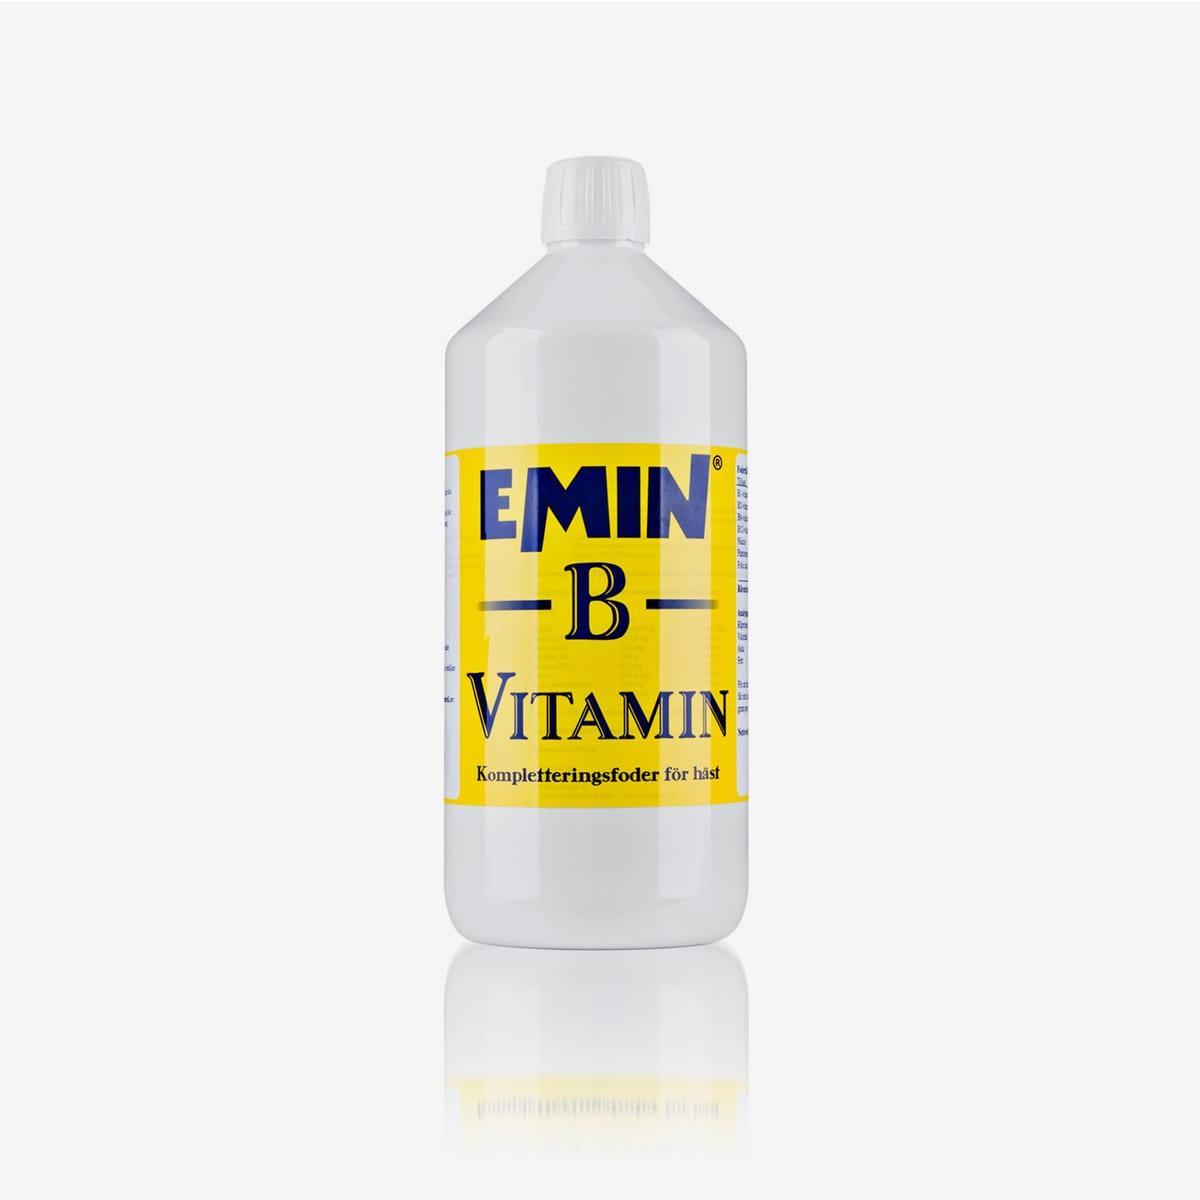 Emin B-vitamin, 1000 ml (Levering*)